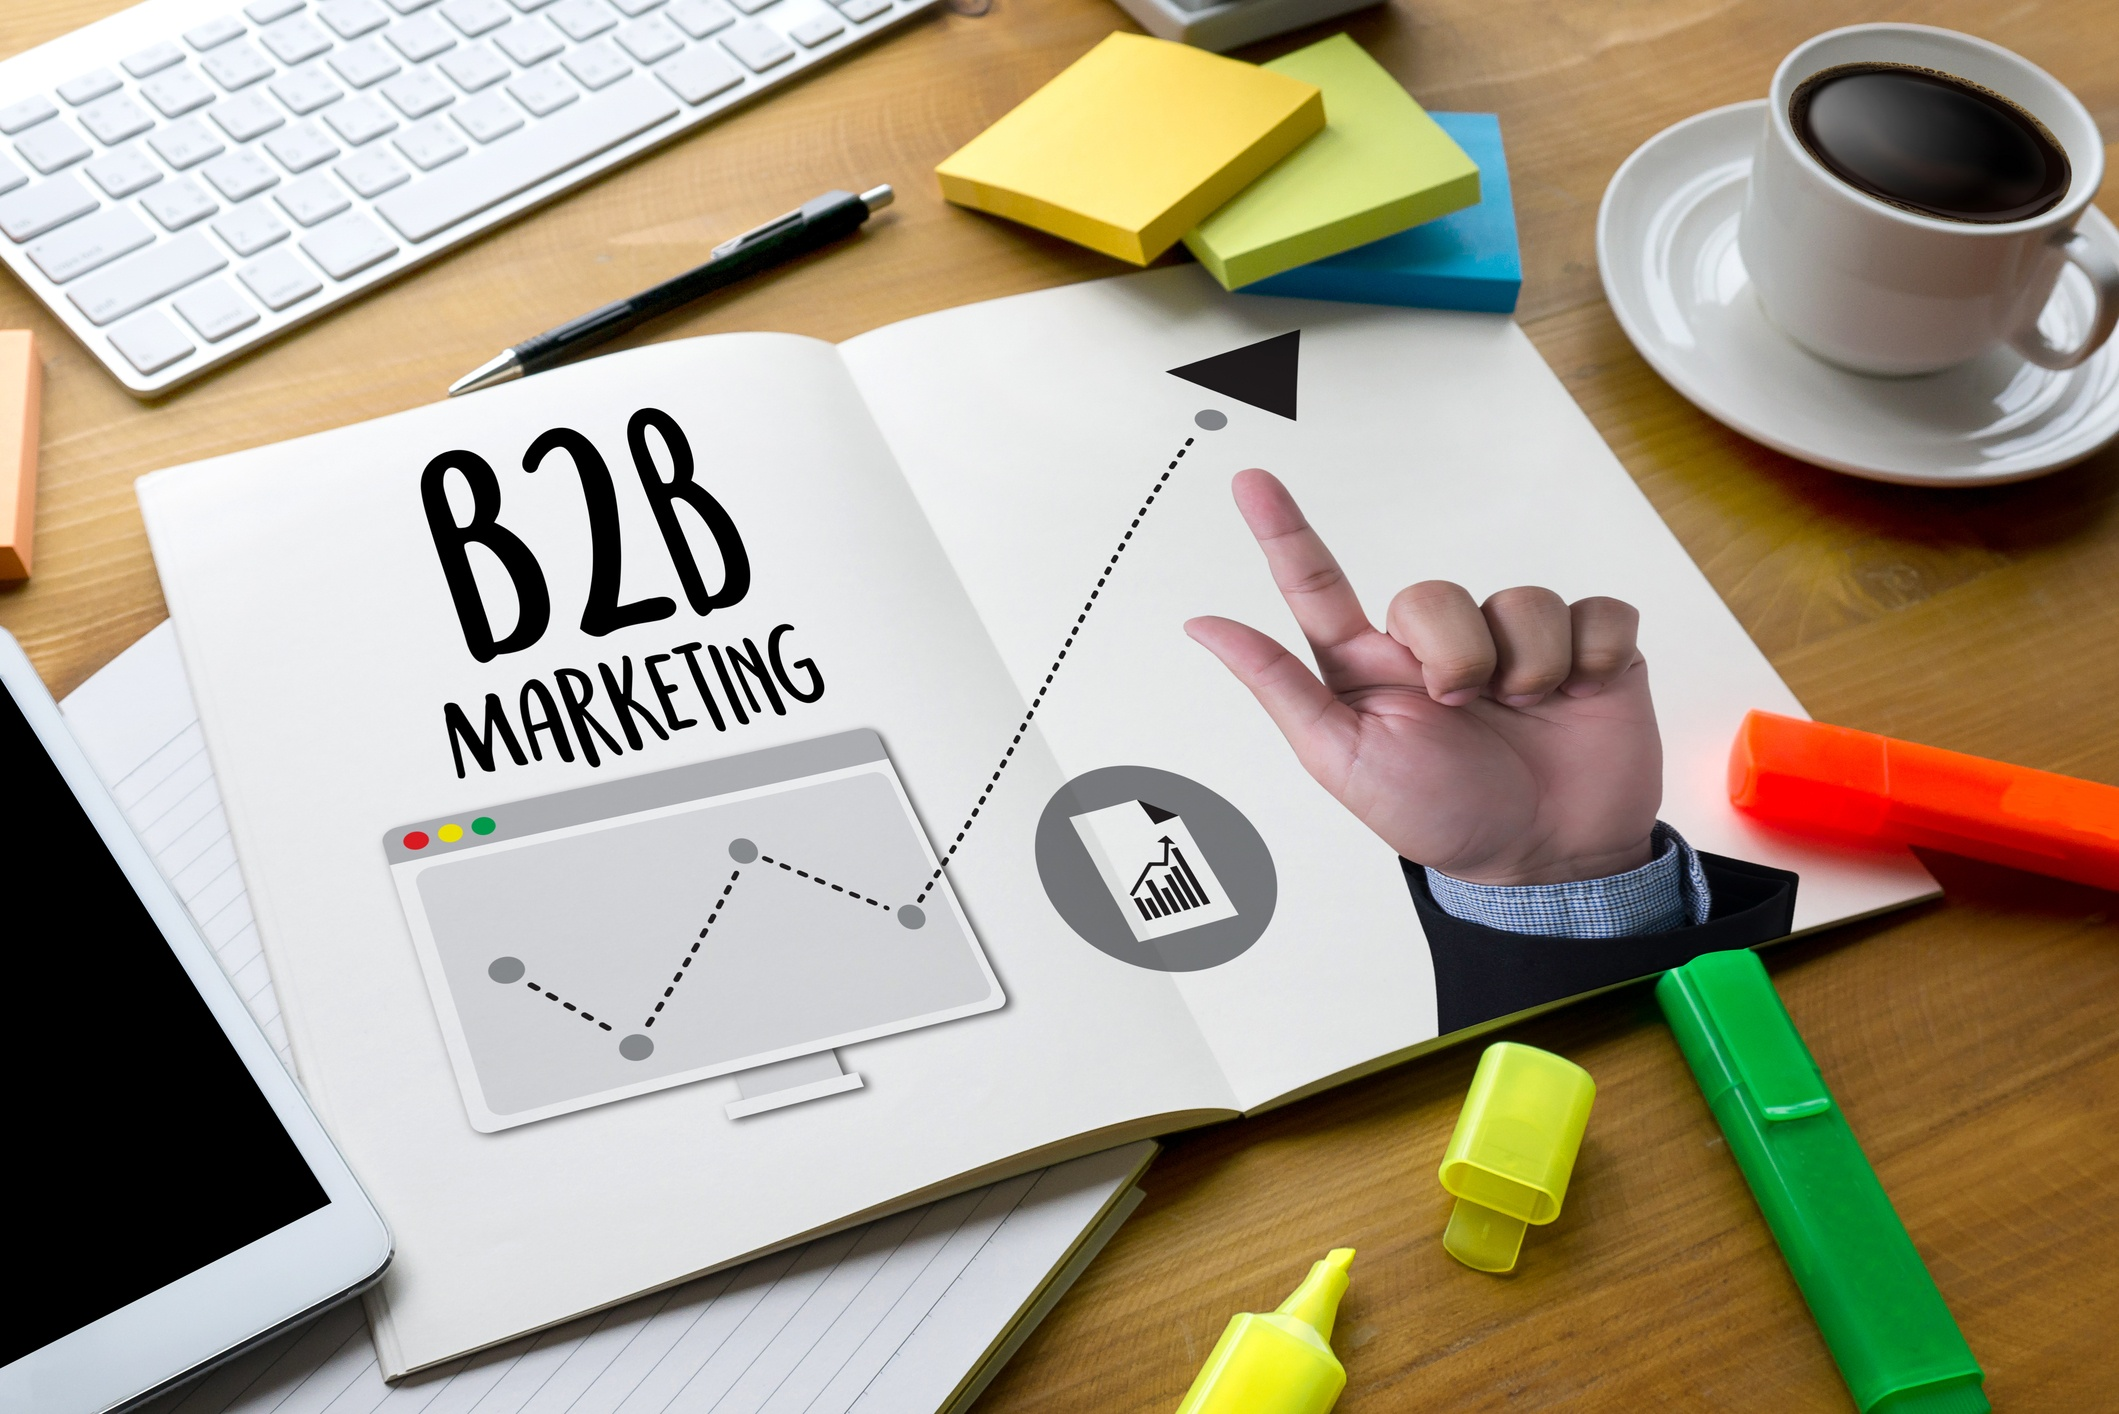 Beginner's Guide to B2B Inbound Marketing in Singapore